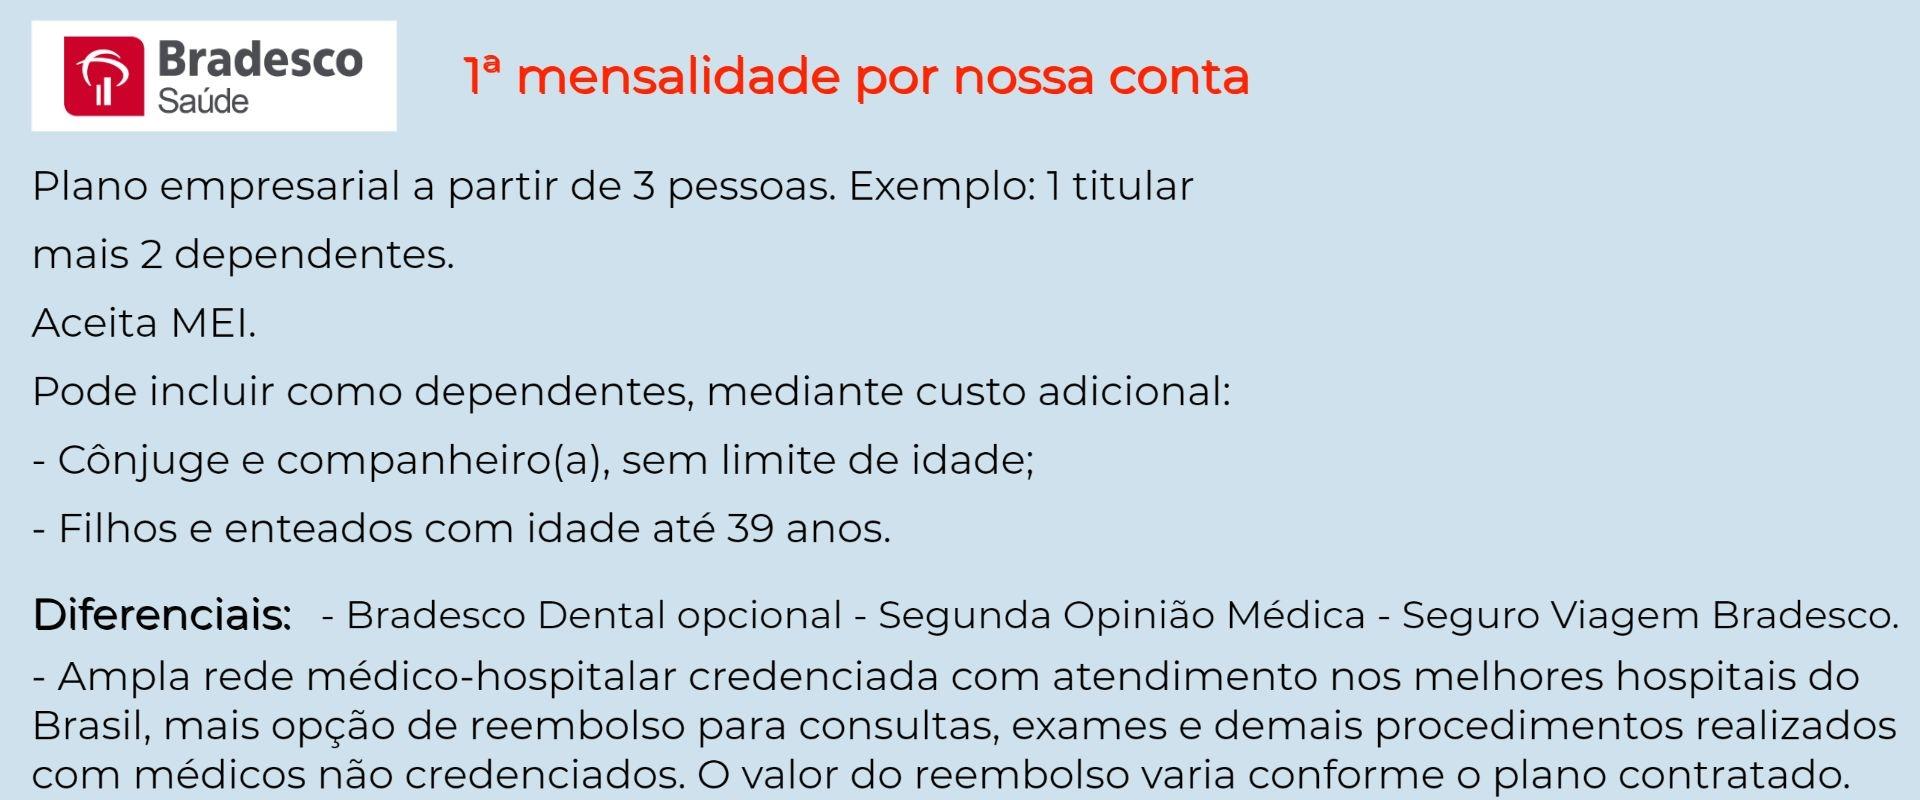 Bradesco Saúde Empresarial – Iguatu